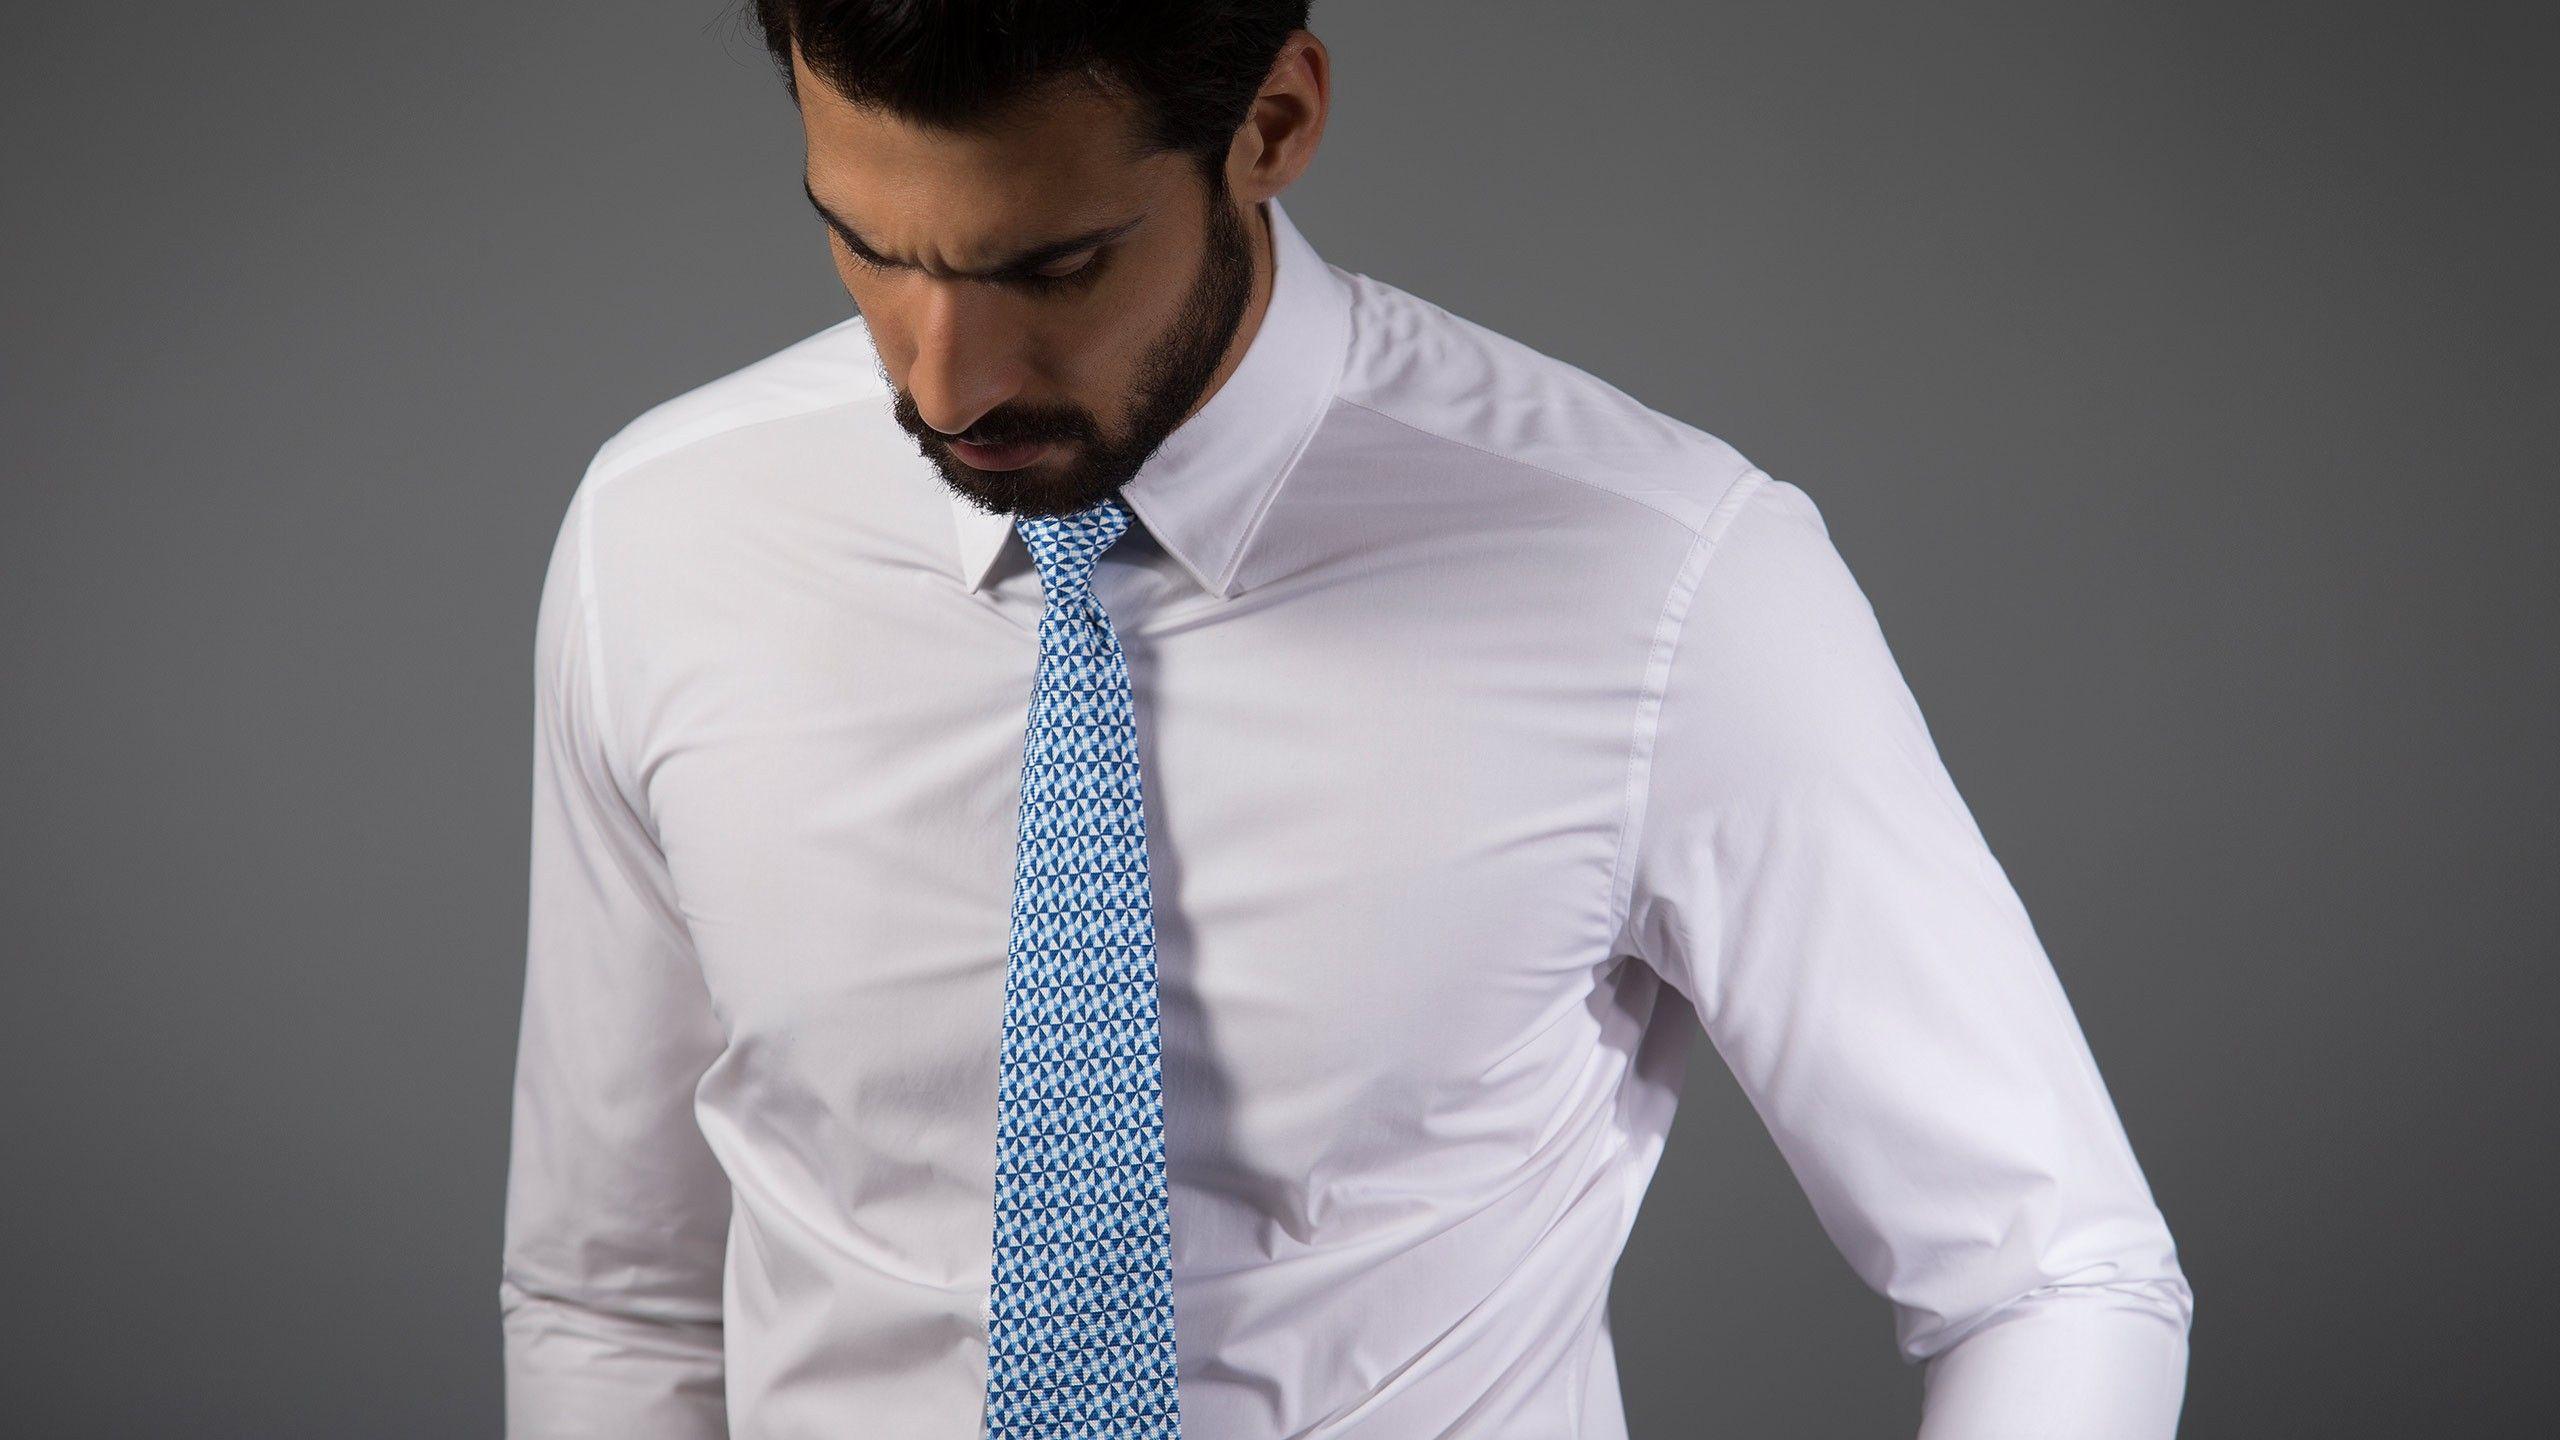 Buy Essential White Shirt - Plain Formal Shirts Online at Andamen ...